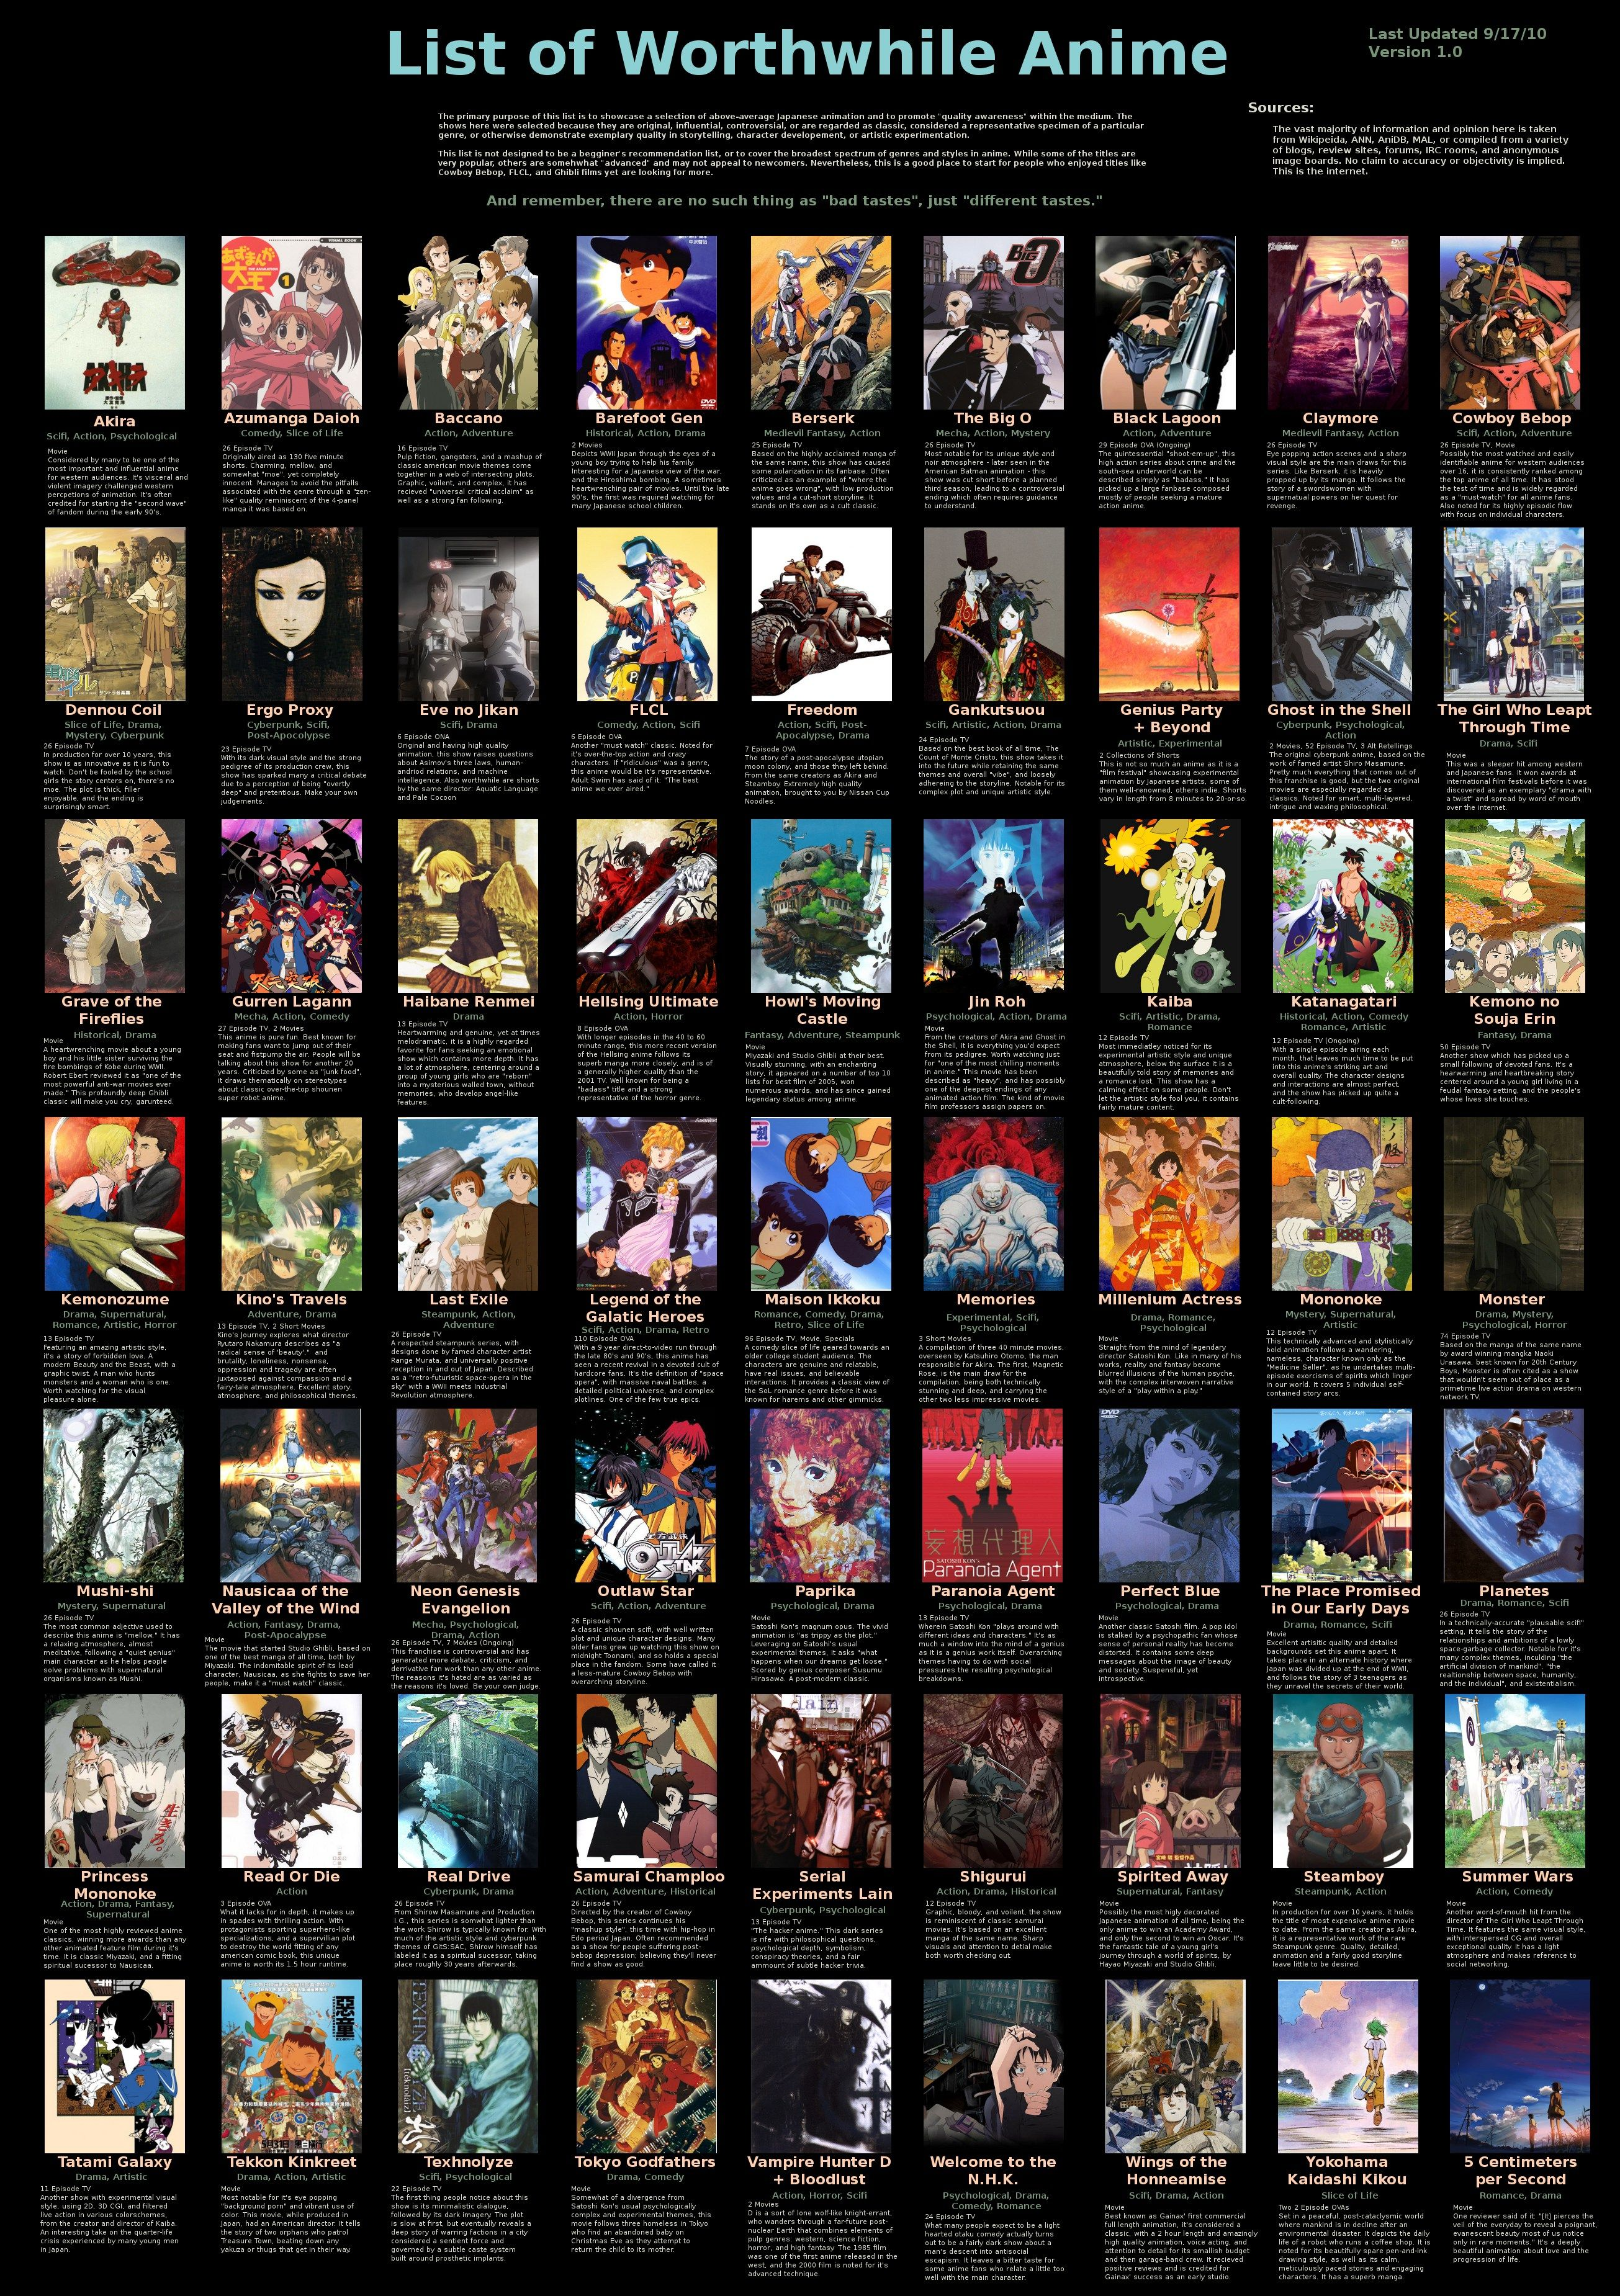 anime Mejores peliculas de anime, Anime